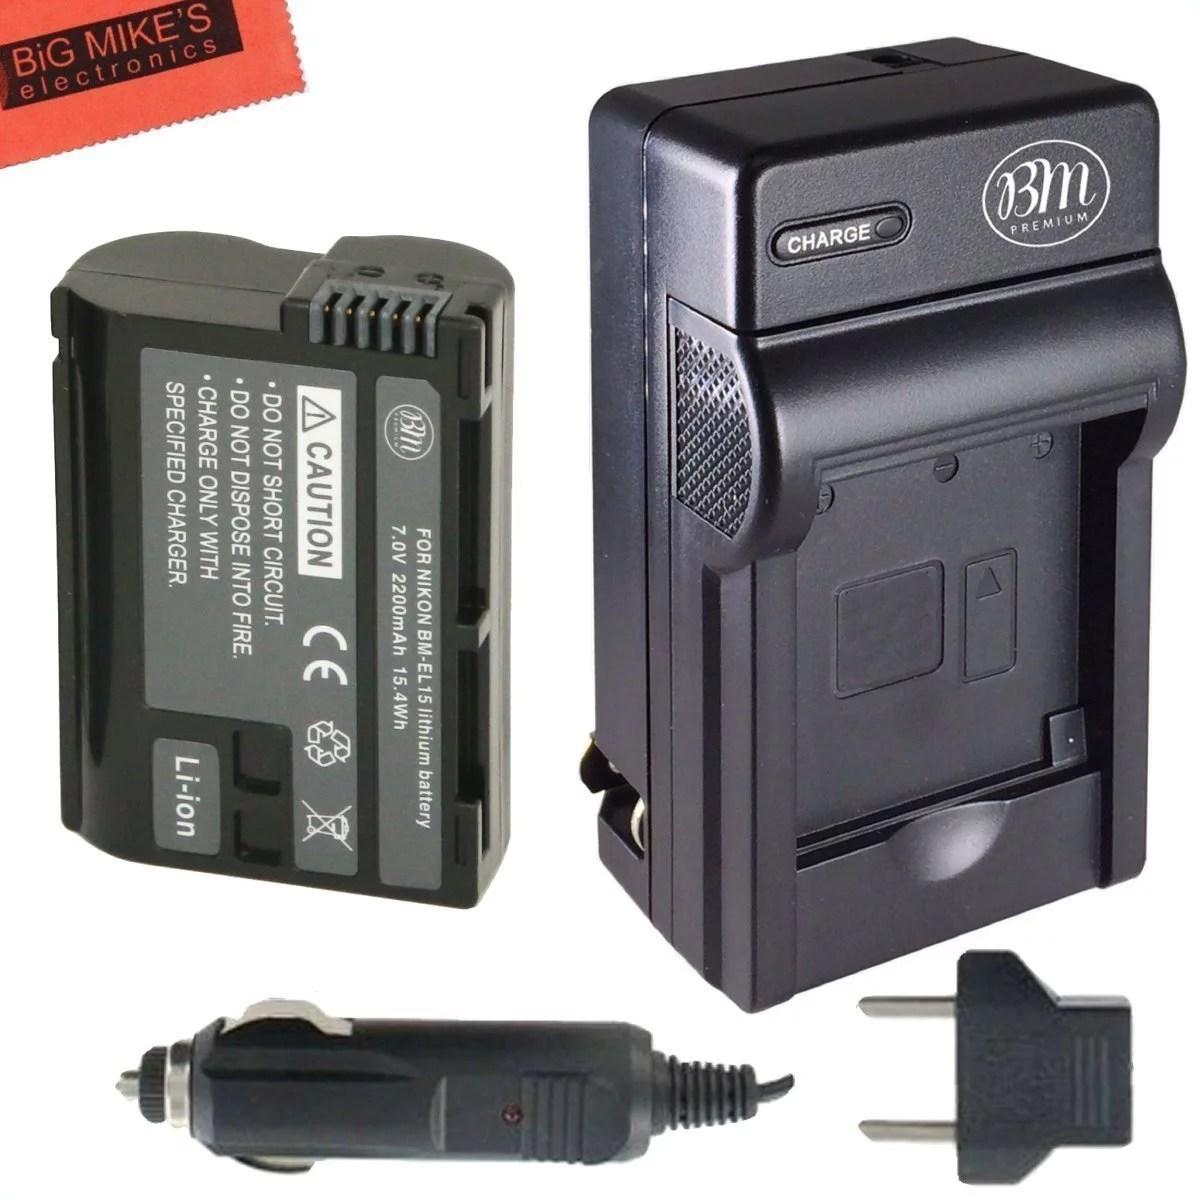 Traditional Nikon Slr Bm Premium Battery Battery Charger Bm Premium Battery Nikon En El15 Charger En El15a Review Battery Charger dpreview En El15